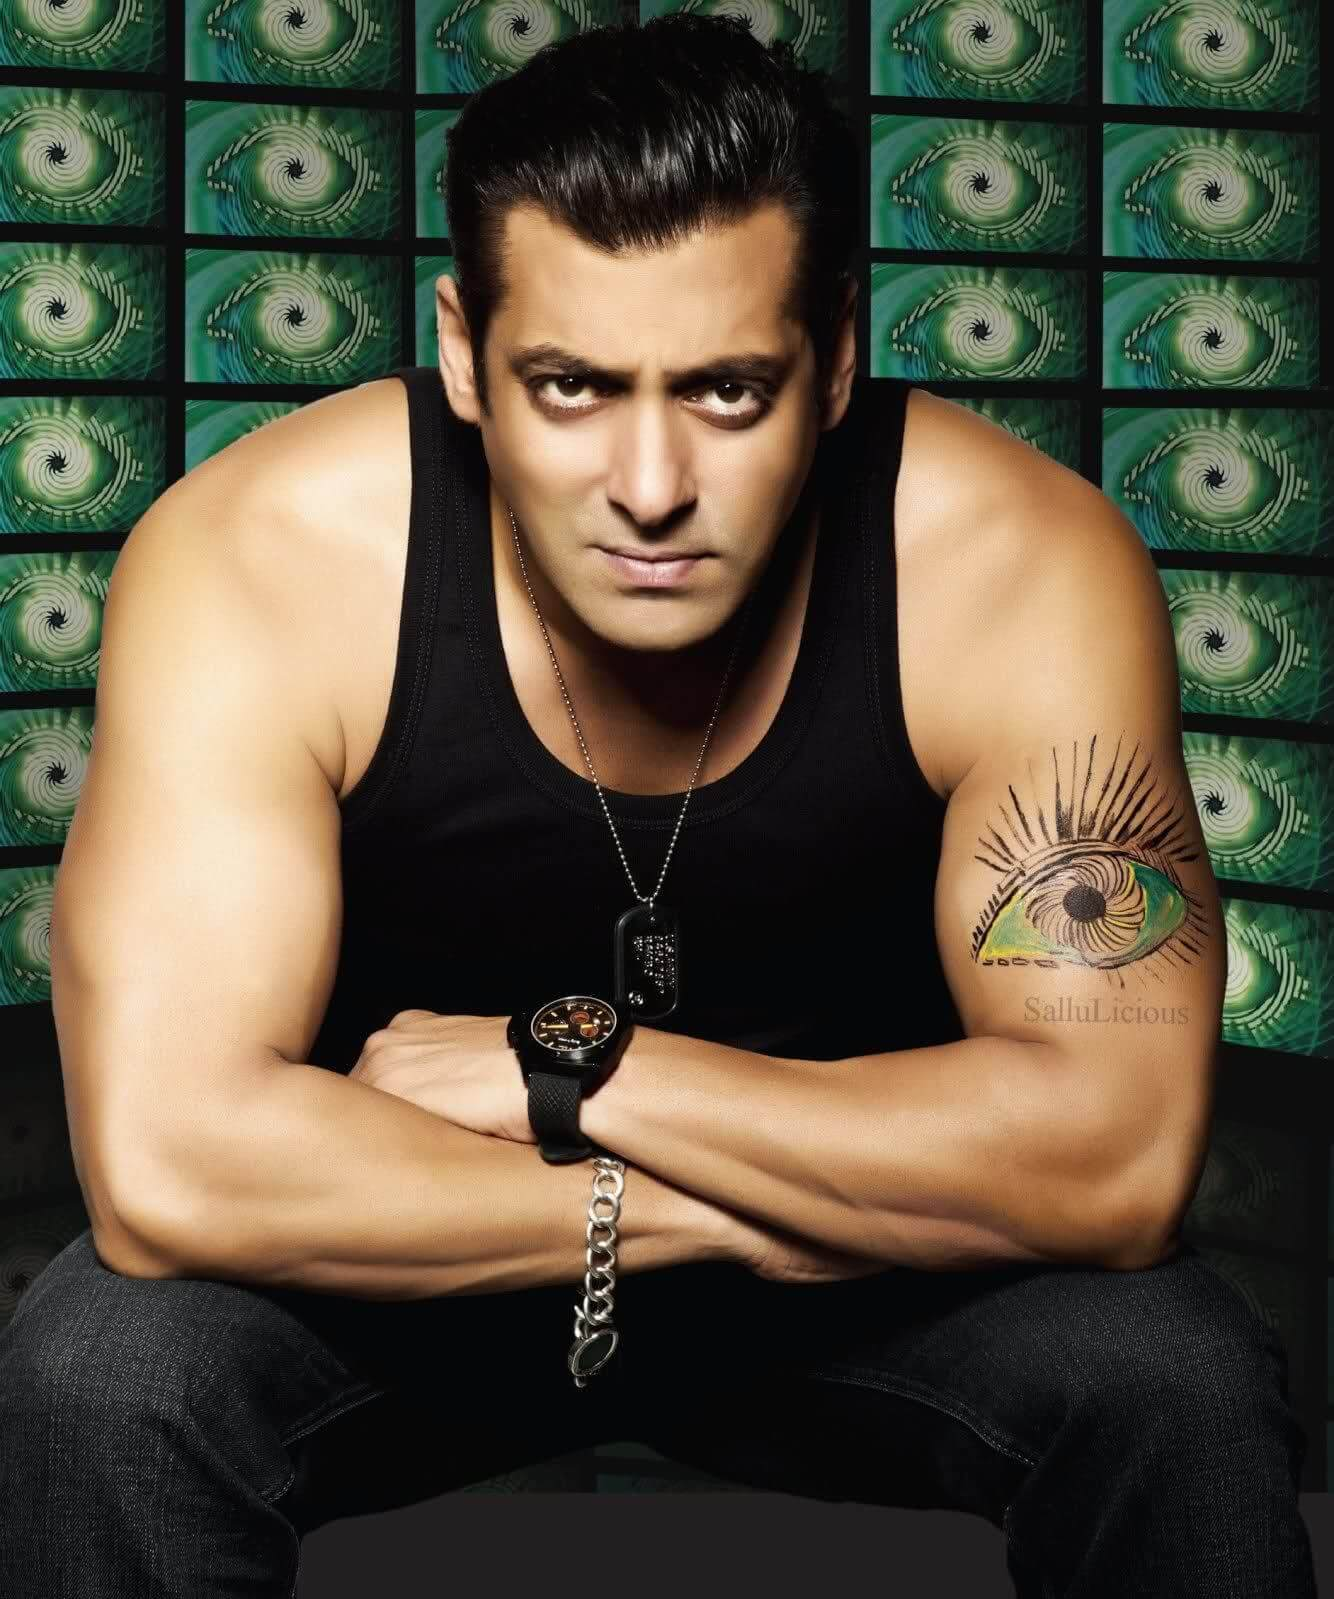 Salman Khan Photo, Age, News, Birthday, Height, Sister, Biography, Girlfriend, Awards, Address, Song, Video, Net Worth, Education, Twitter, Instagram, Facebook, Wiki, Imdb, Website, Youtube (17)